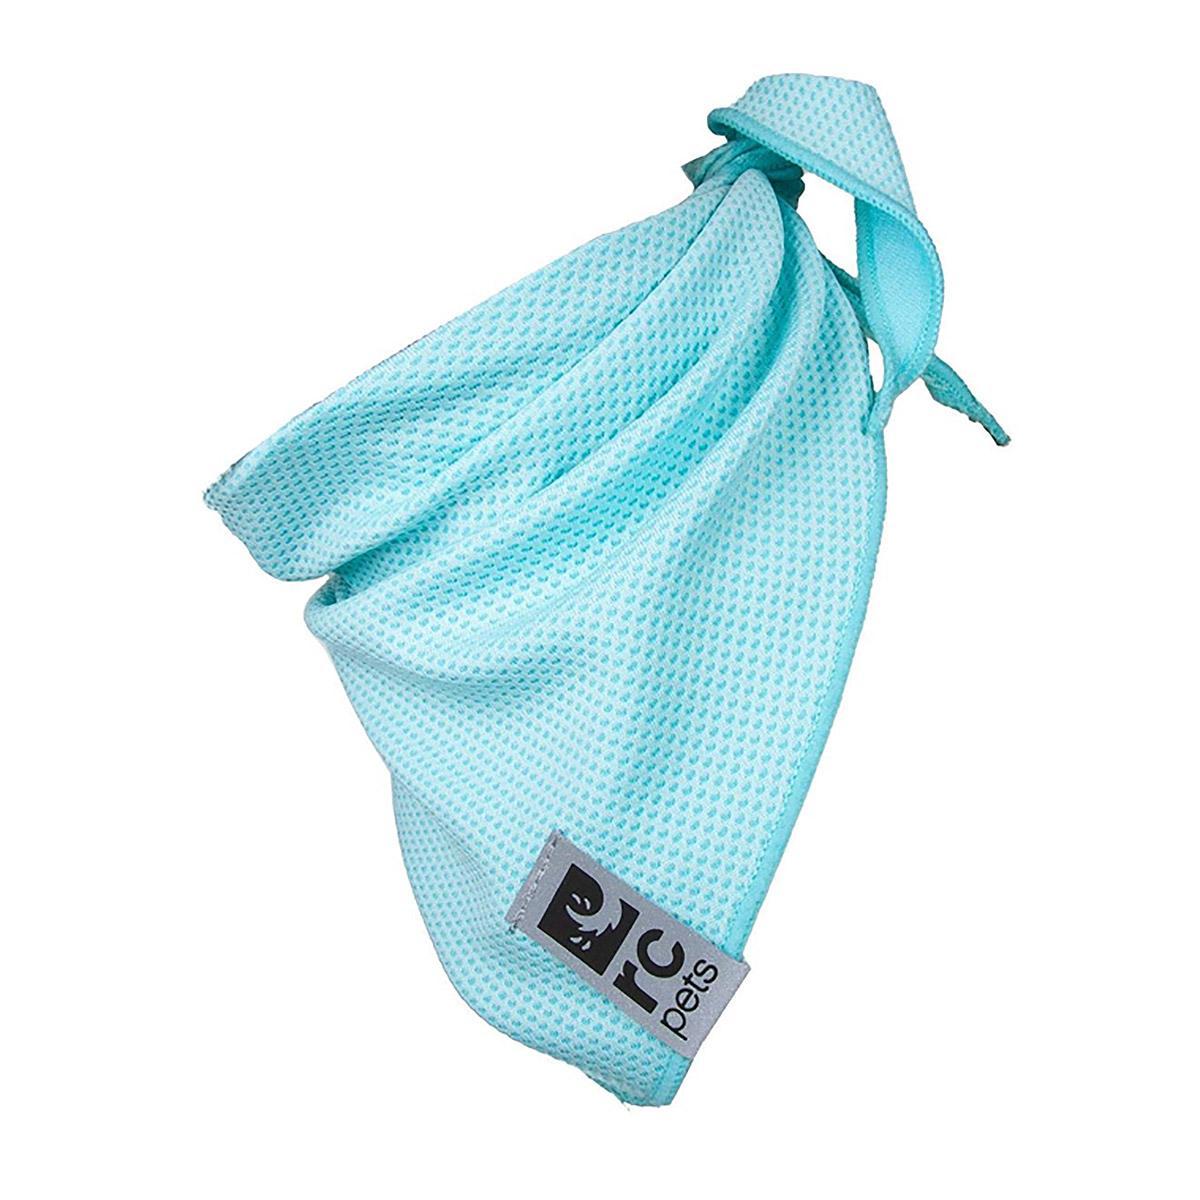 Zephyr Cooling Dog Bandana by RC Pets - Ice Blue